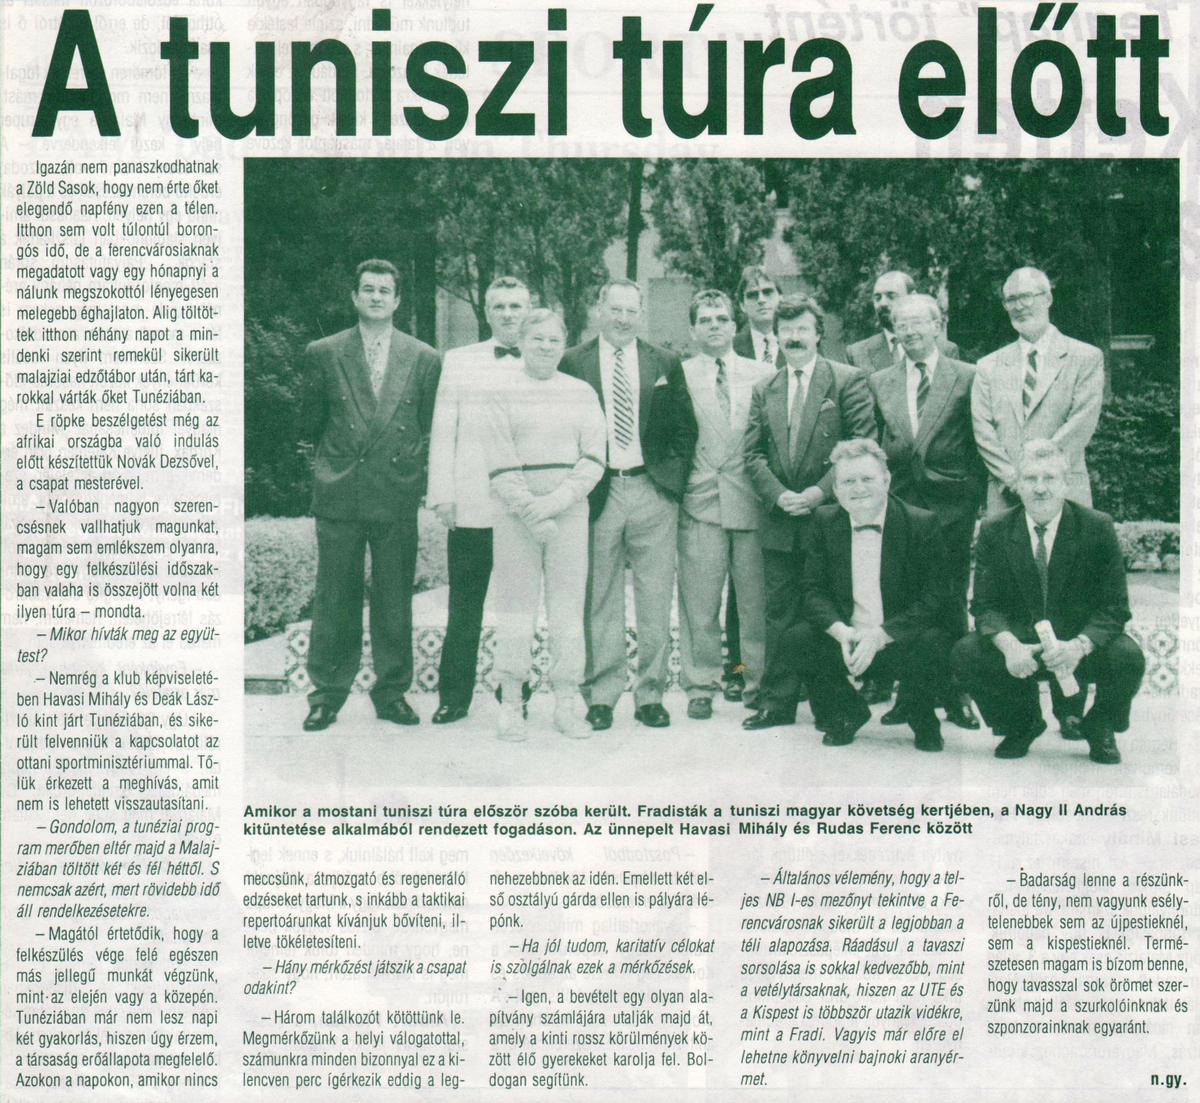 TFU_19950200_FU_001 - 0004